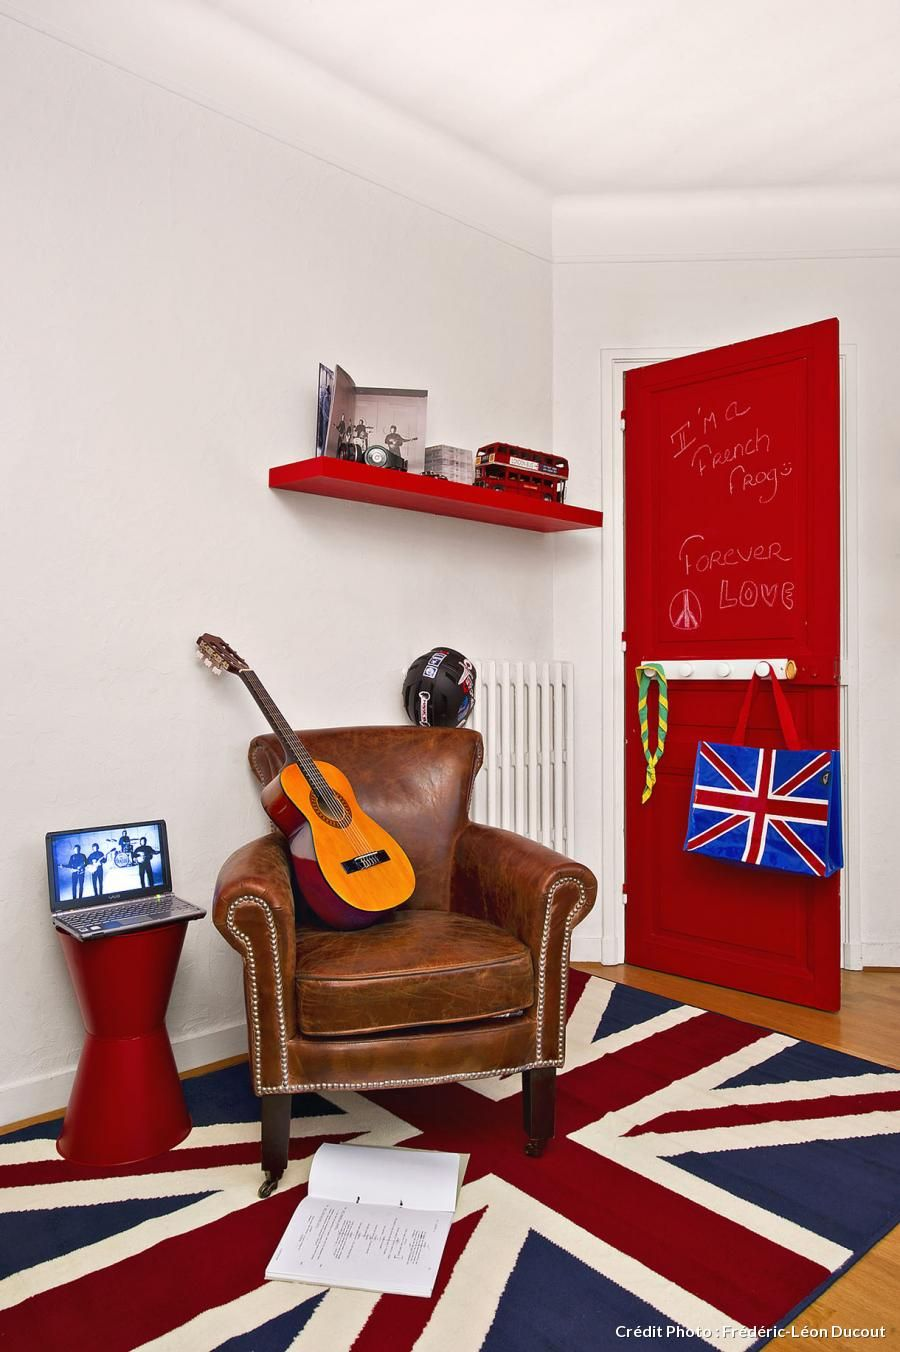 chambre ado porte rouge craie style british - Decoration Chambre Ado Style Anglais